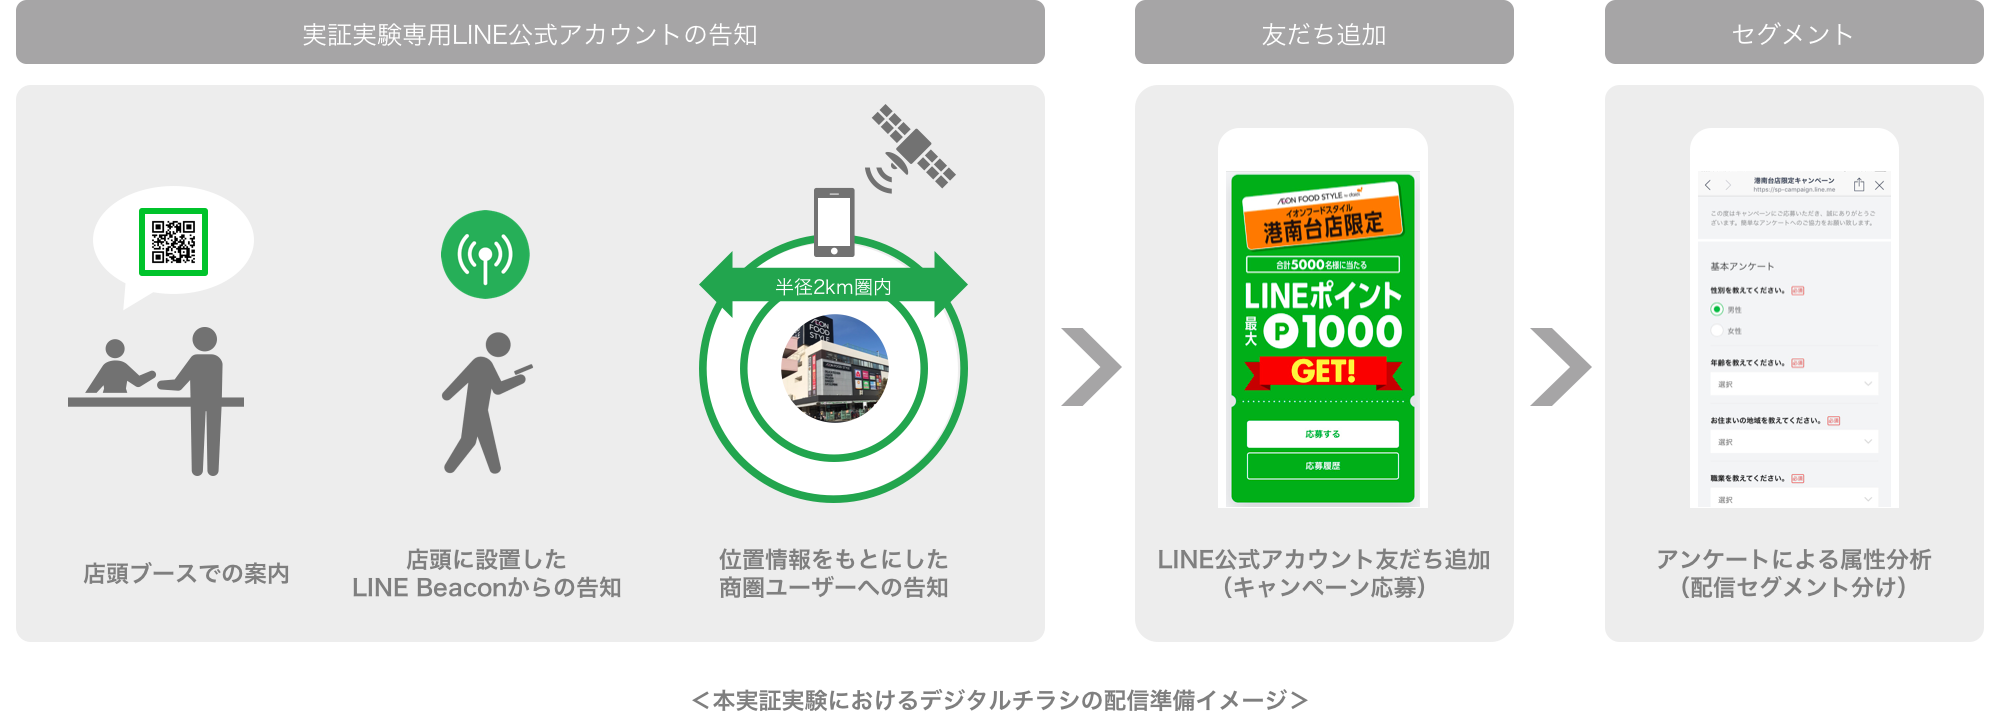 /stf/linecorp/ja/pr/jyunbi.png